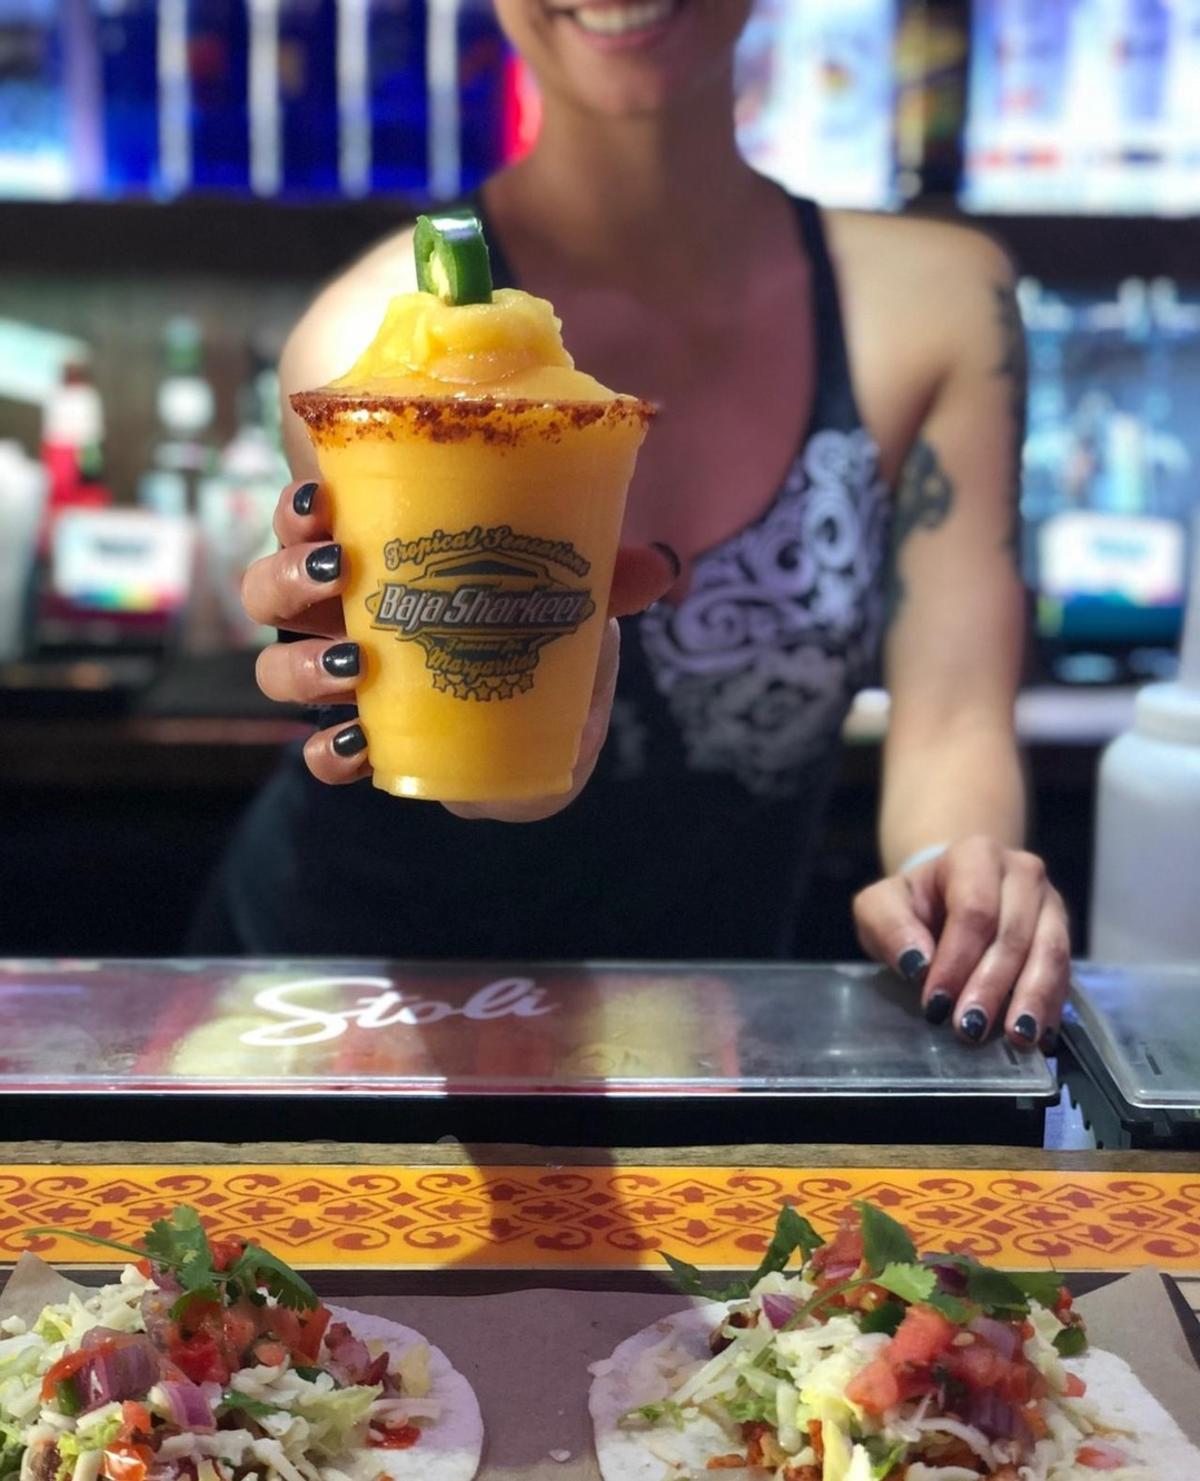 Bartender serving a drink at Baja Sharkeez in Huntington Beach